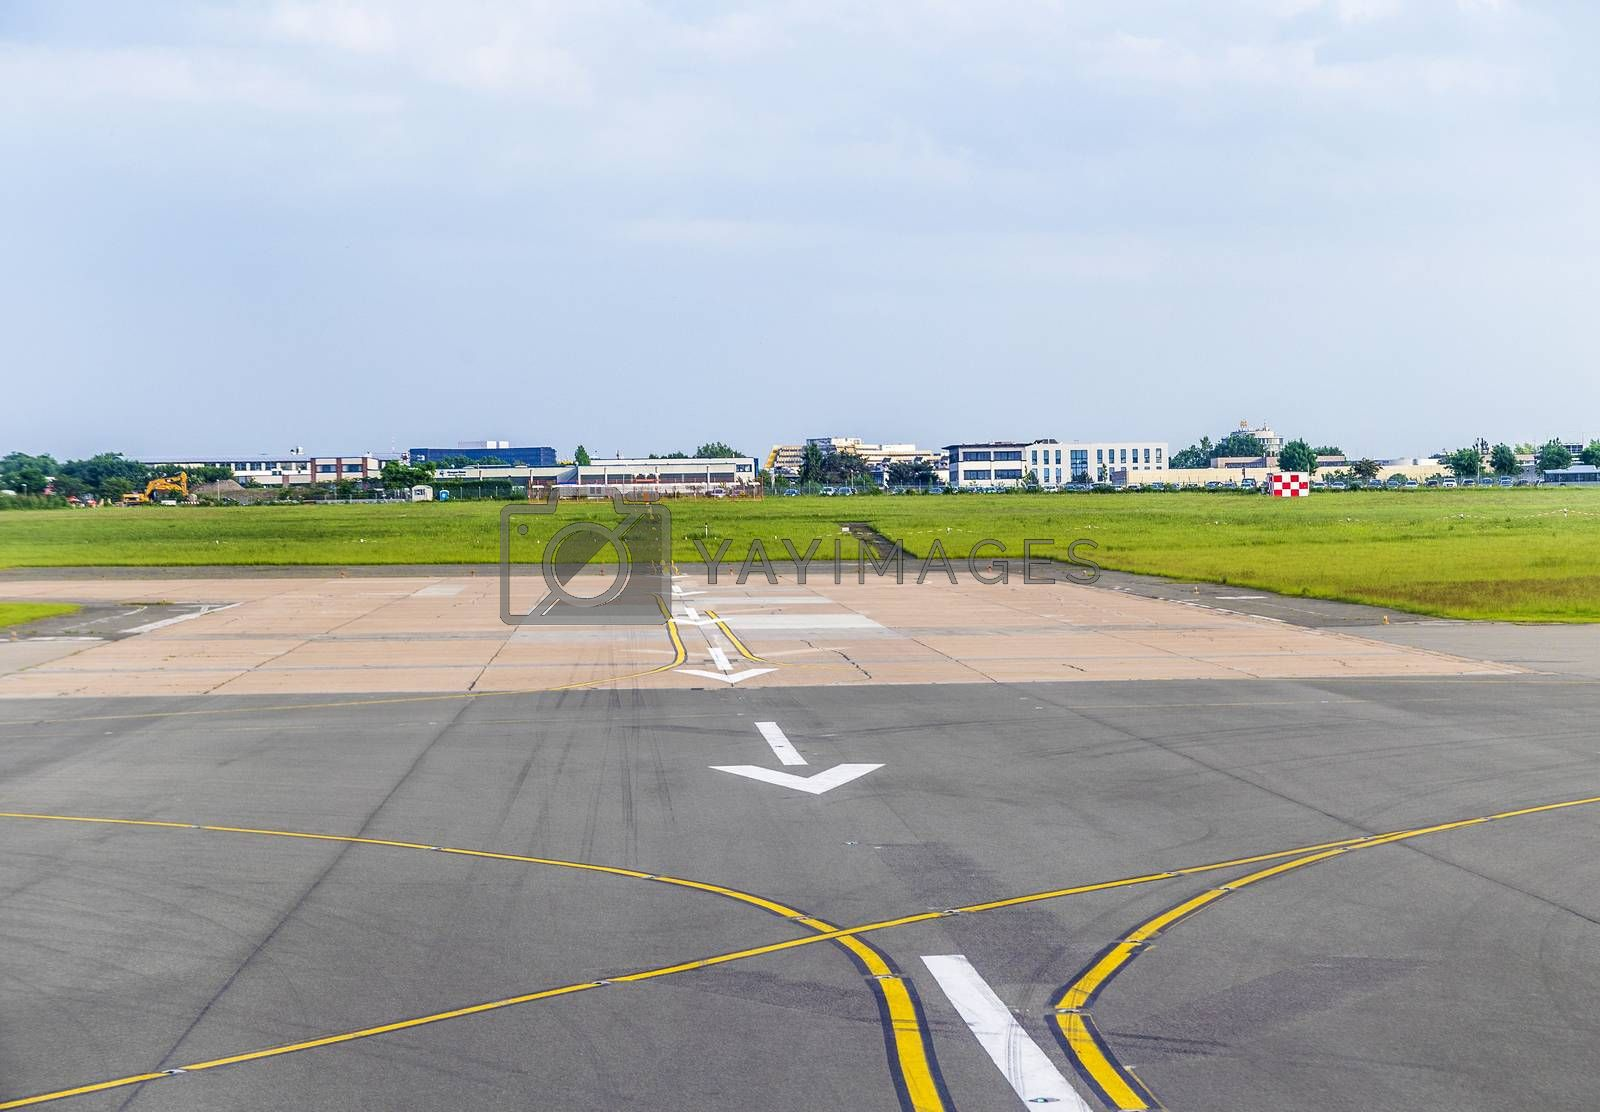 white arrows at airport runway landing zone